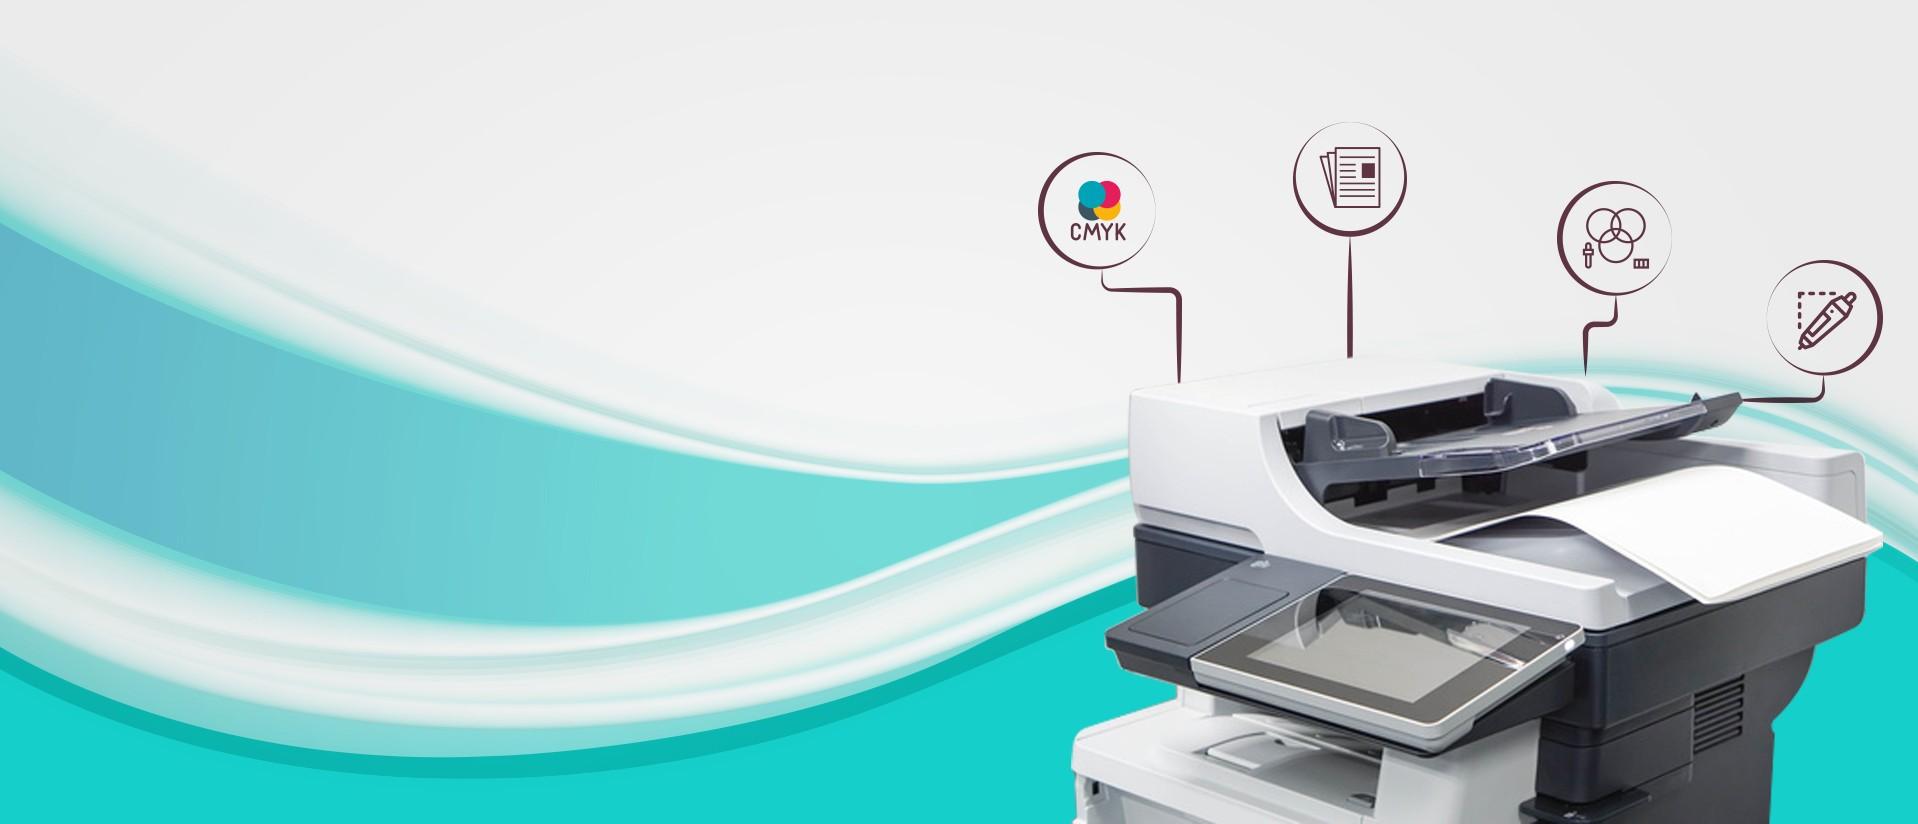 Sistemi di stampa